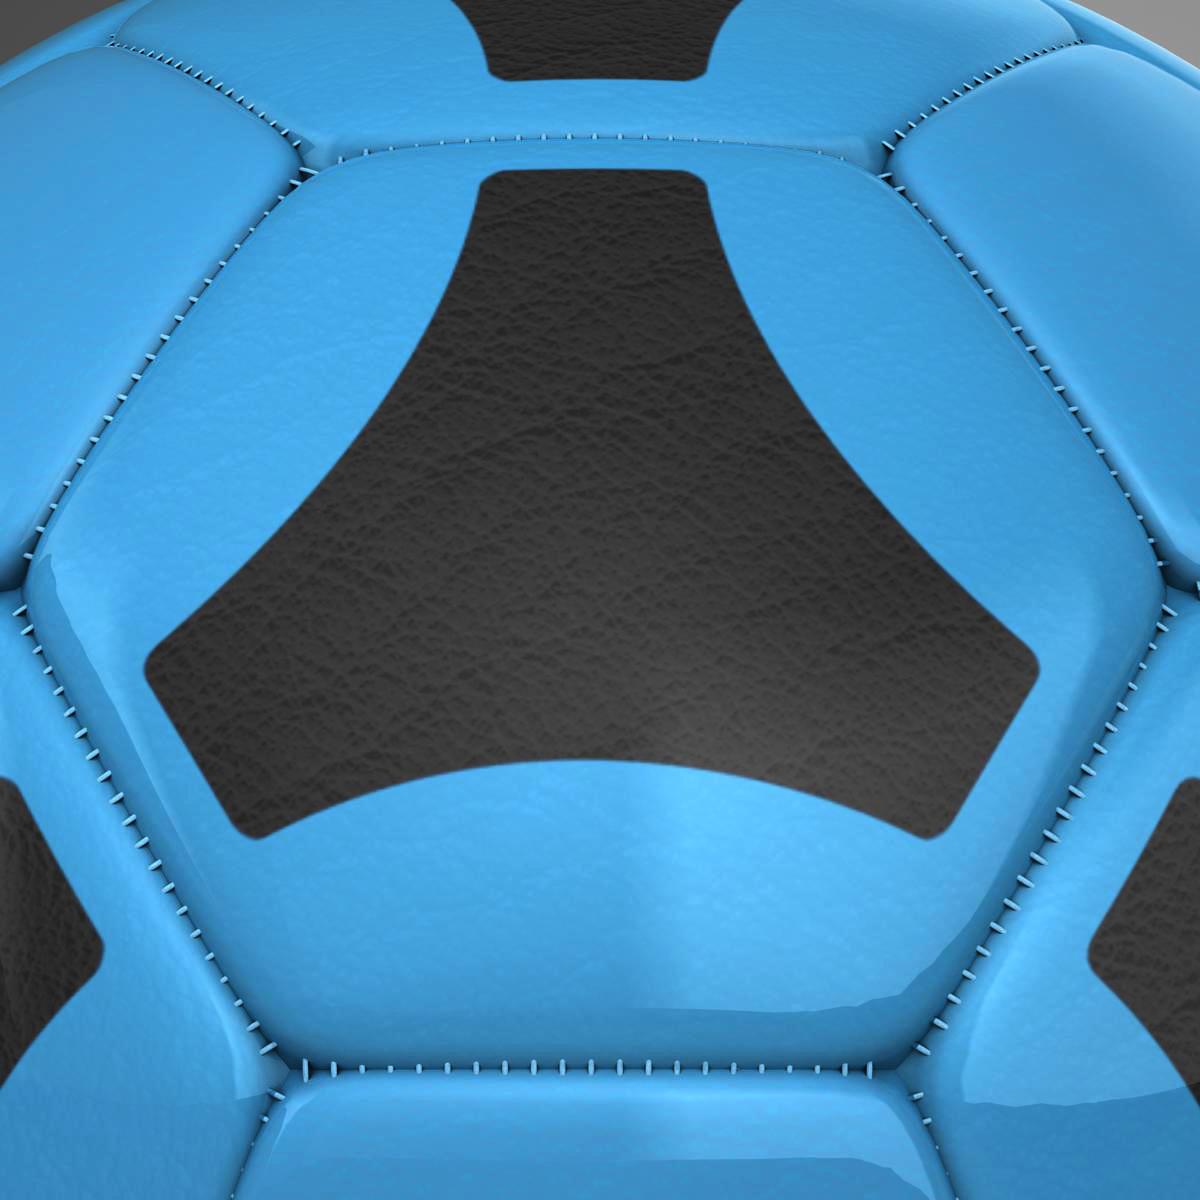 soccerball цэнхэр хар 3d загвар 3ds max fbx c4d ma mb obj 204383